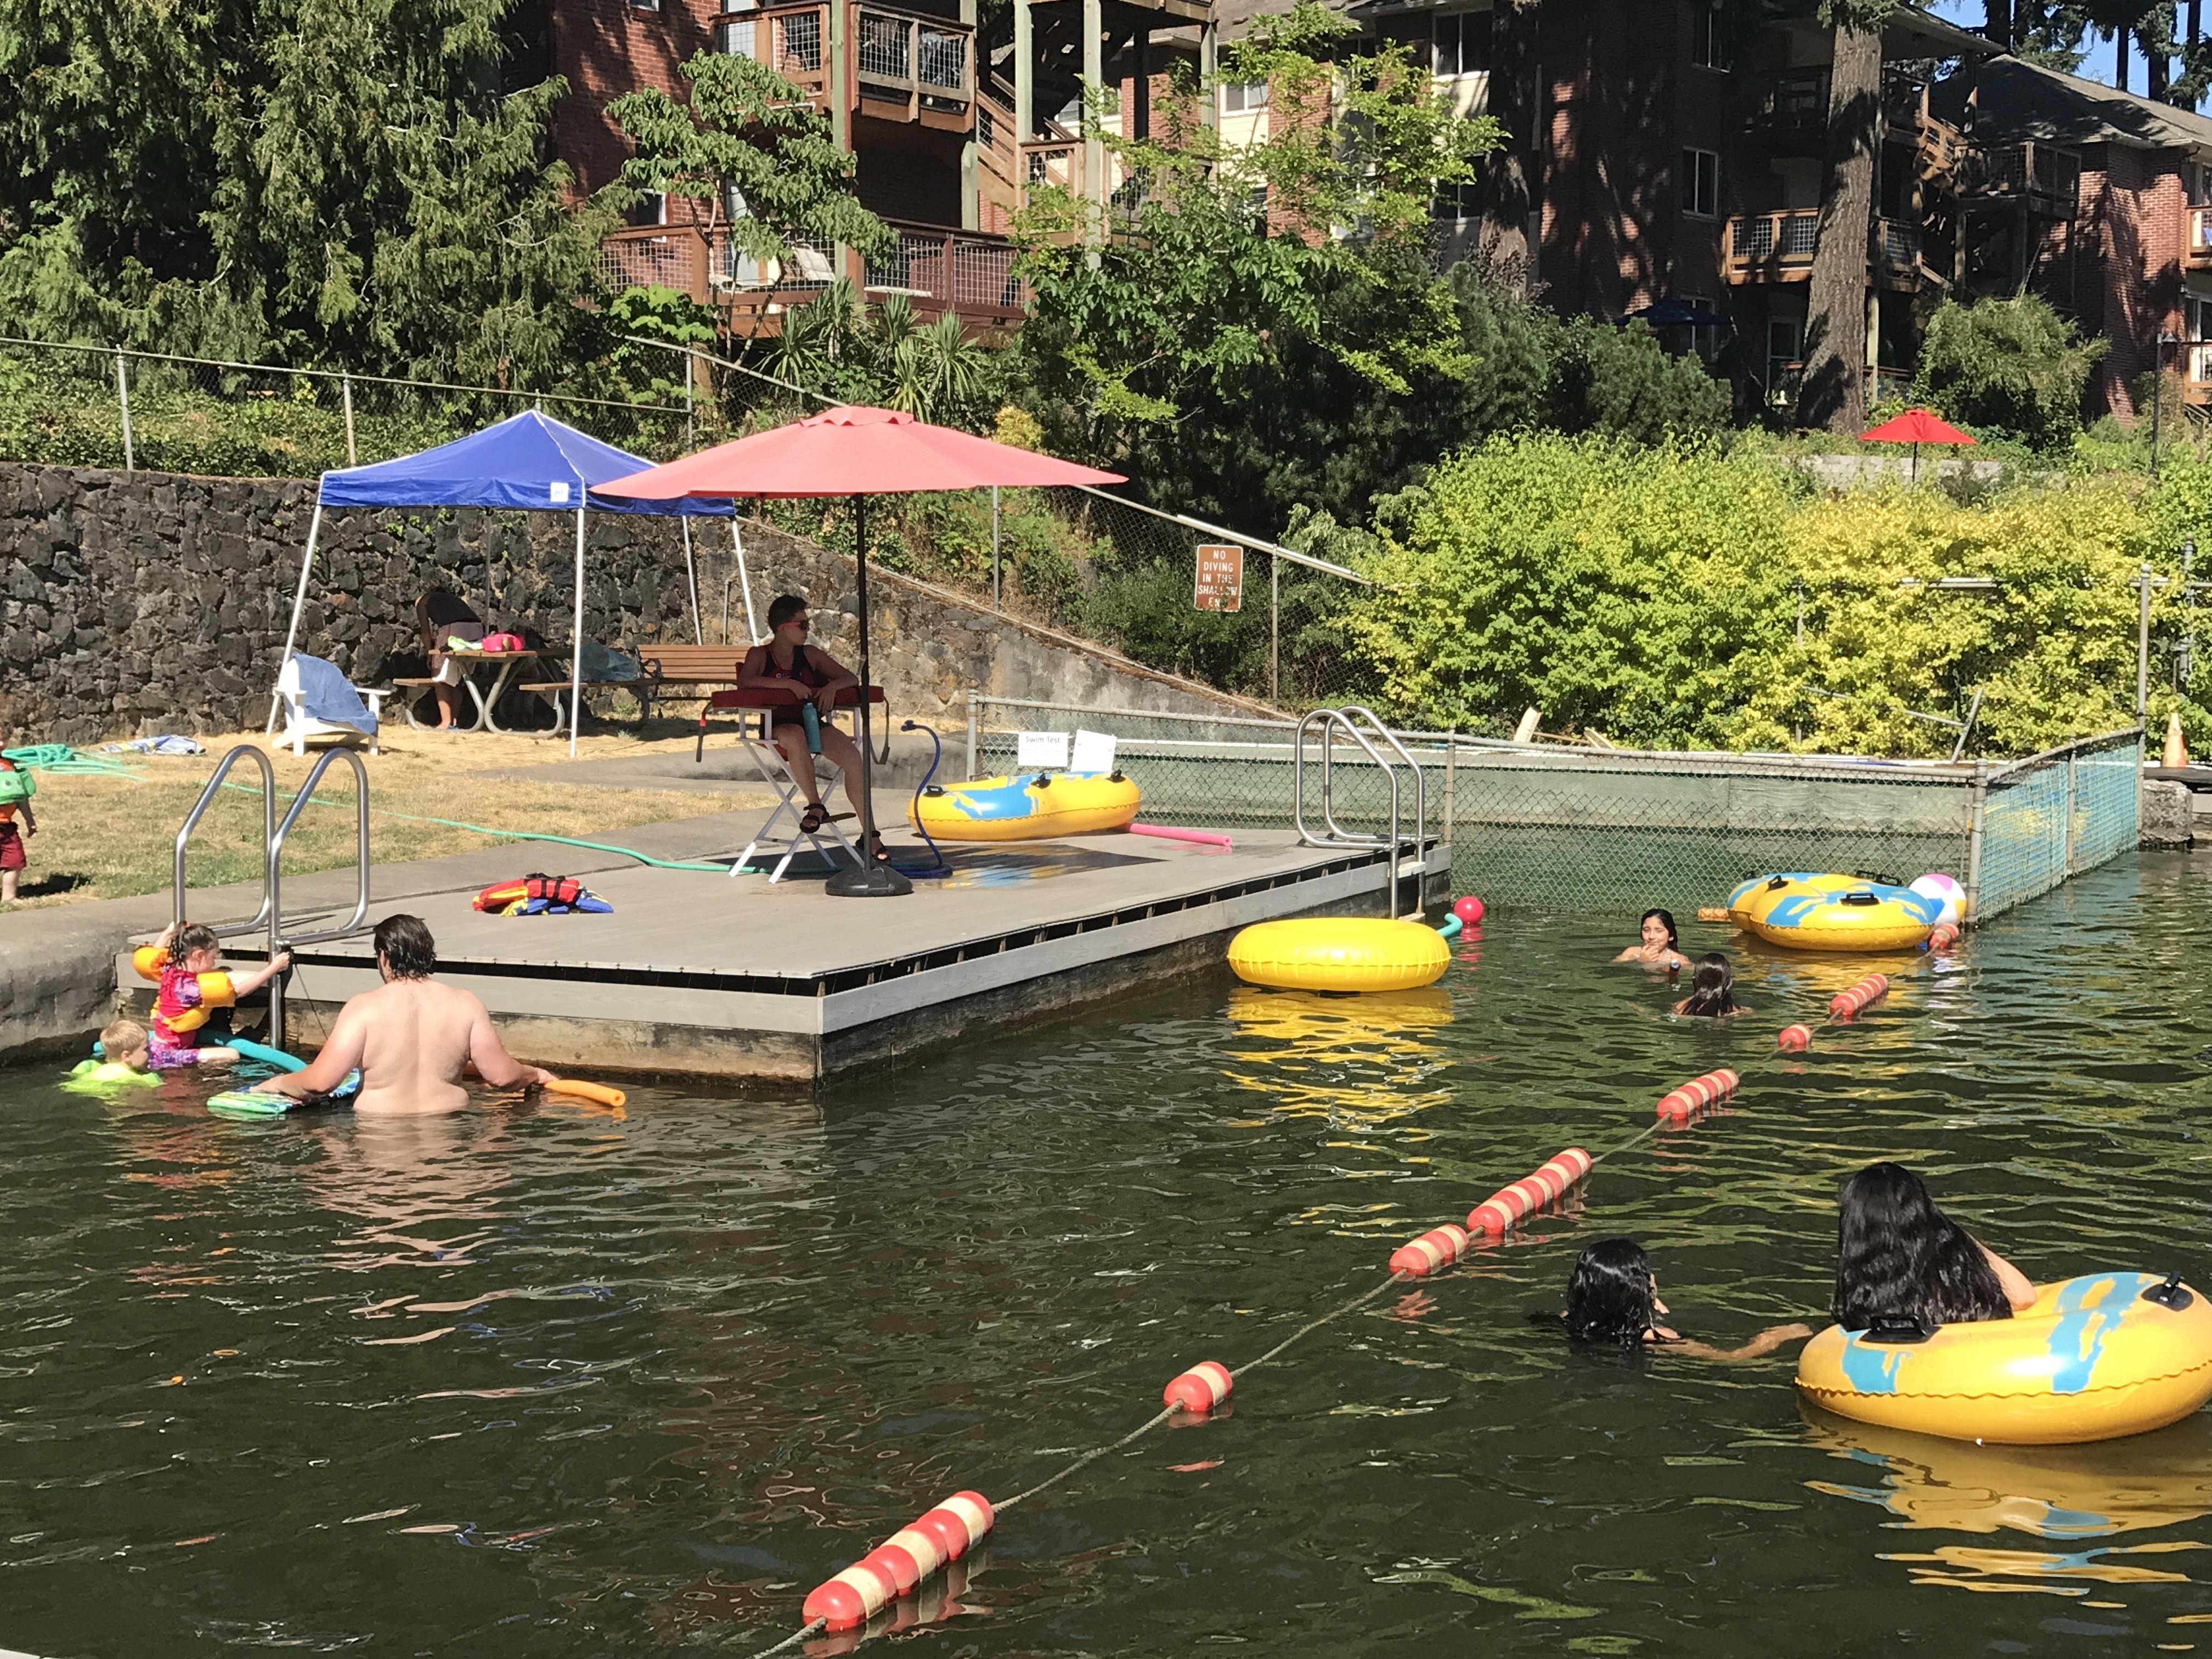 Lake oswego swim park city of lake oswego for Park road swimming pool opening times